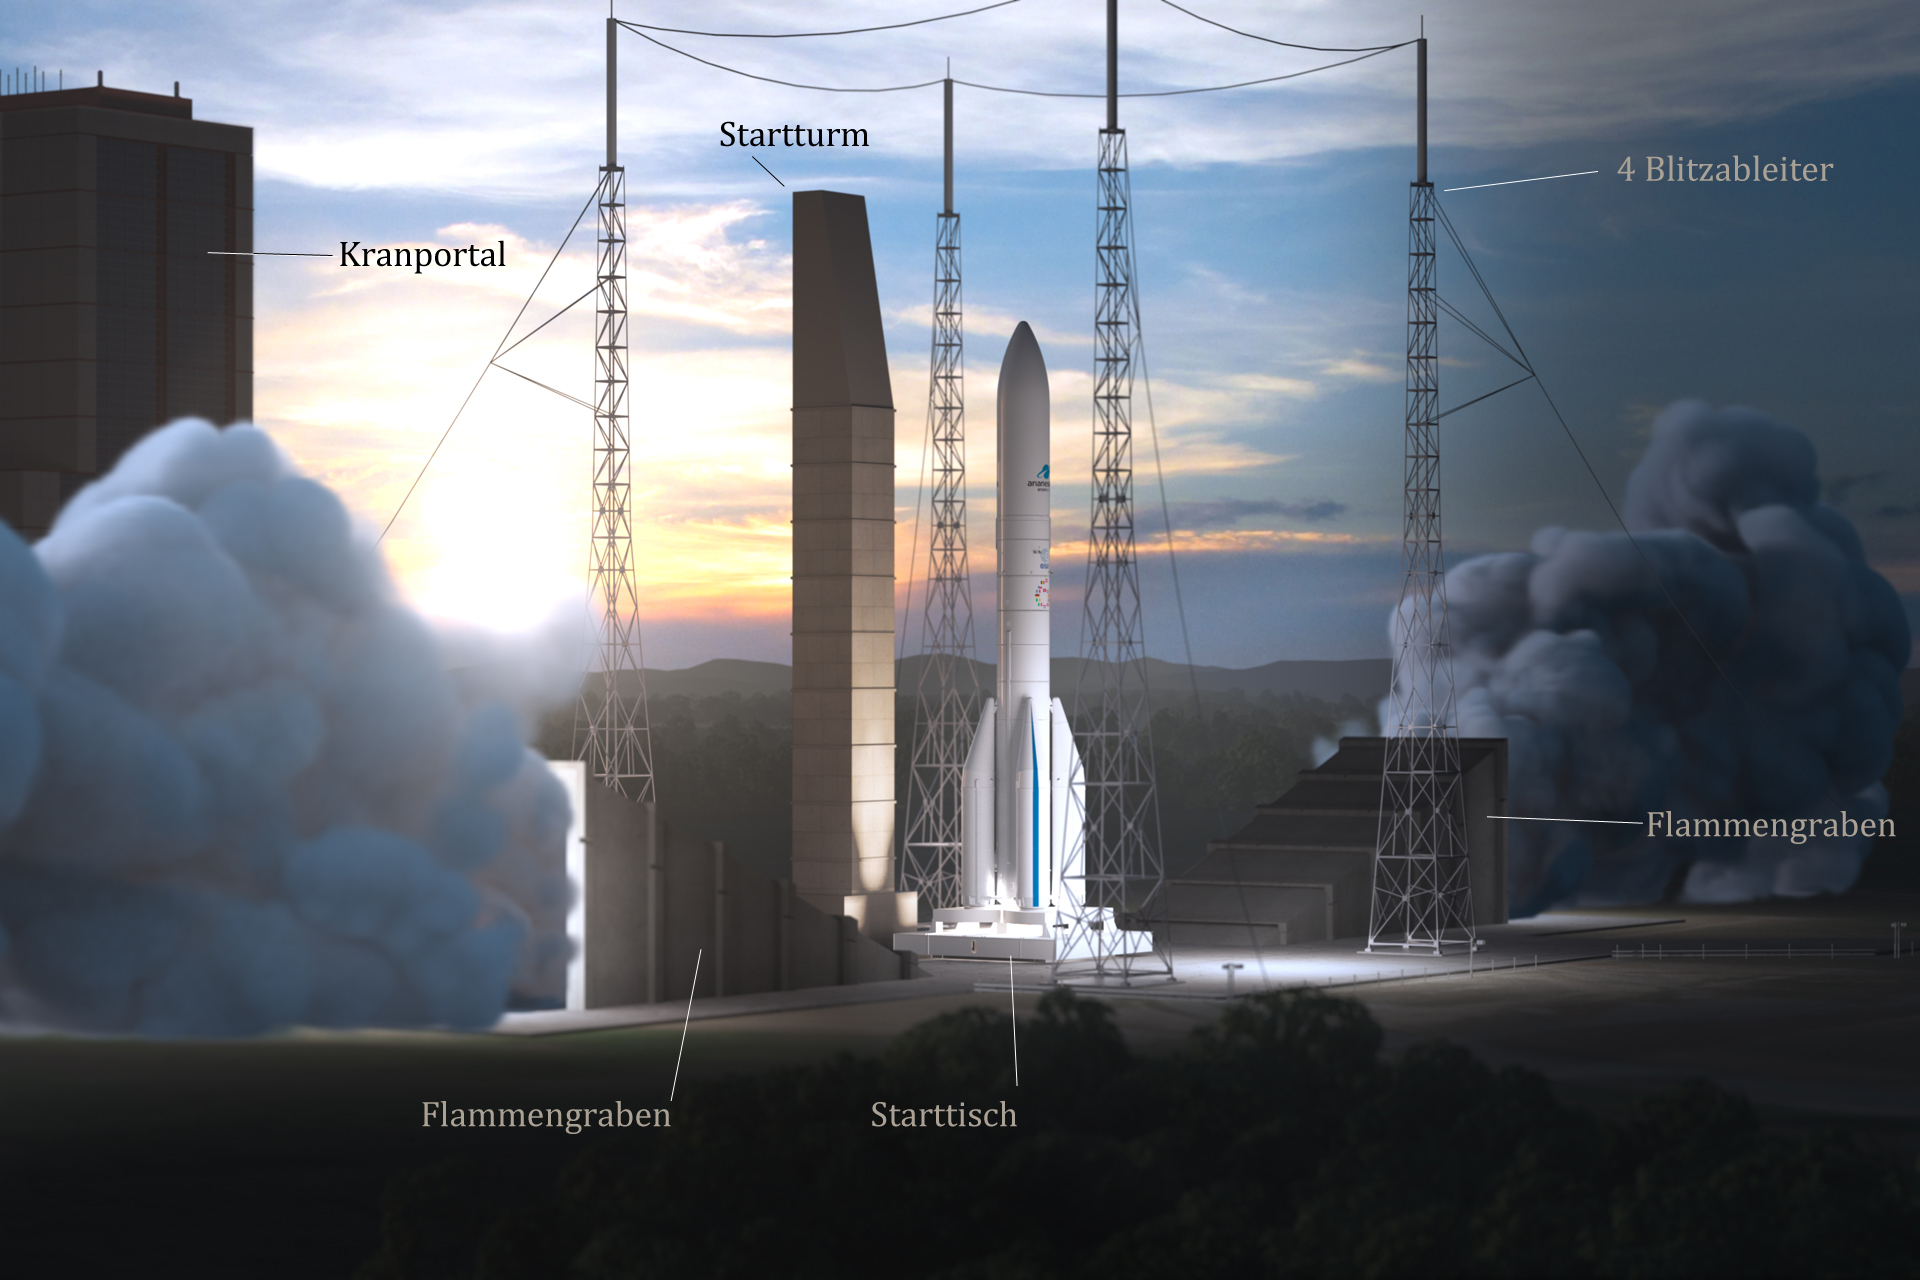 Ariane Launchpad. Copyright: ESA/Arianespace Beschriftung: Ute Gerhardt